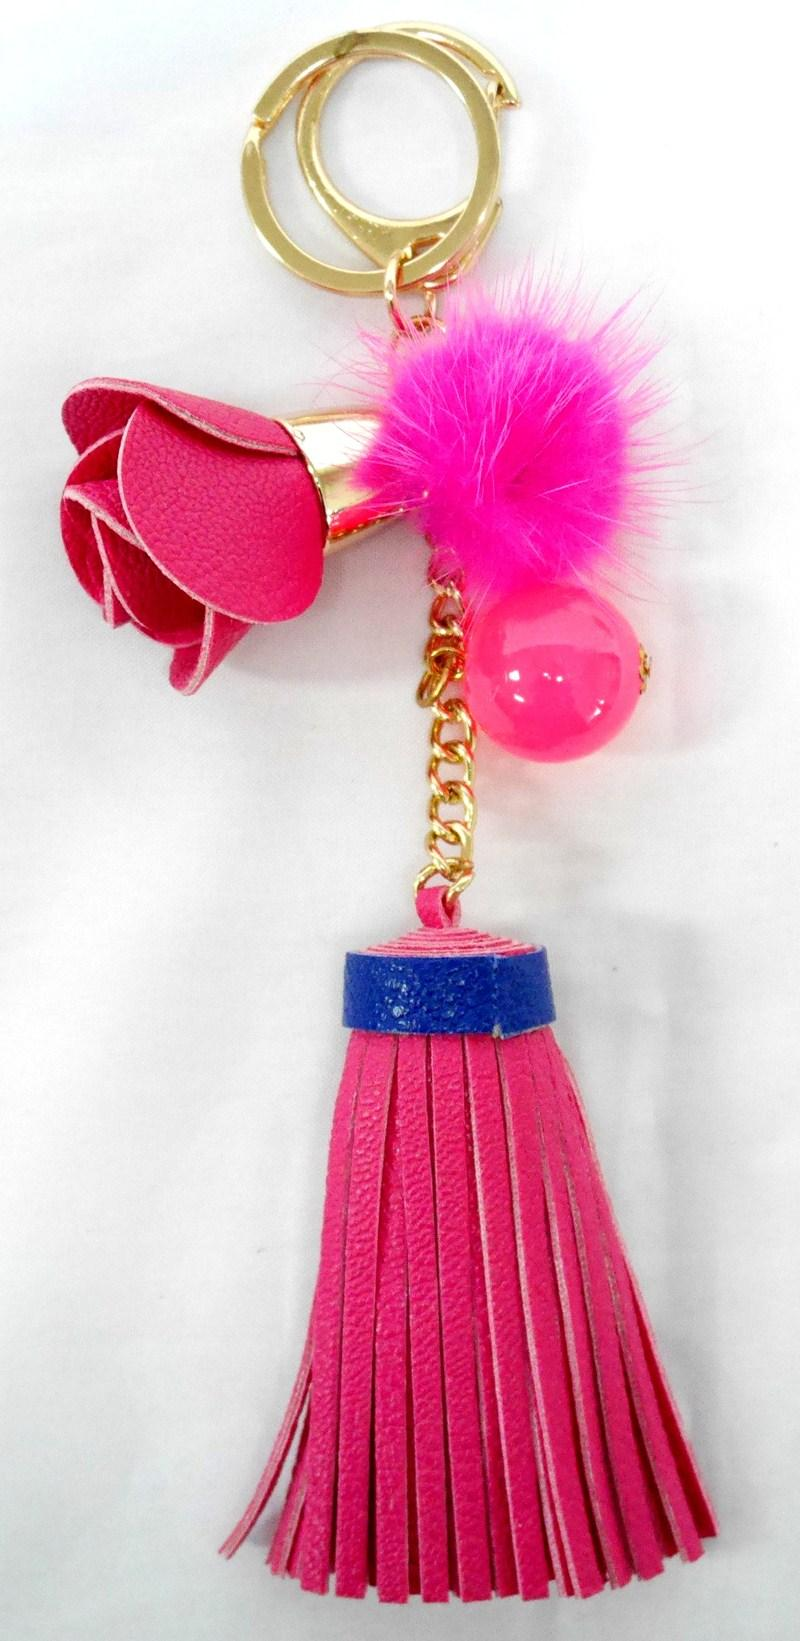 SIV Leather Keychain Bunga 01 Gantungan Kunci - Pink [KB04]